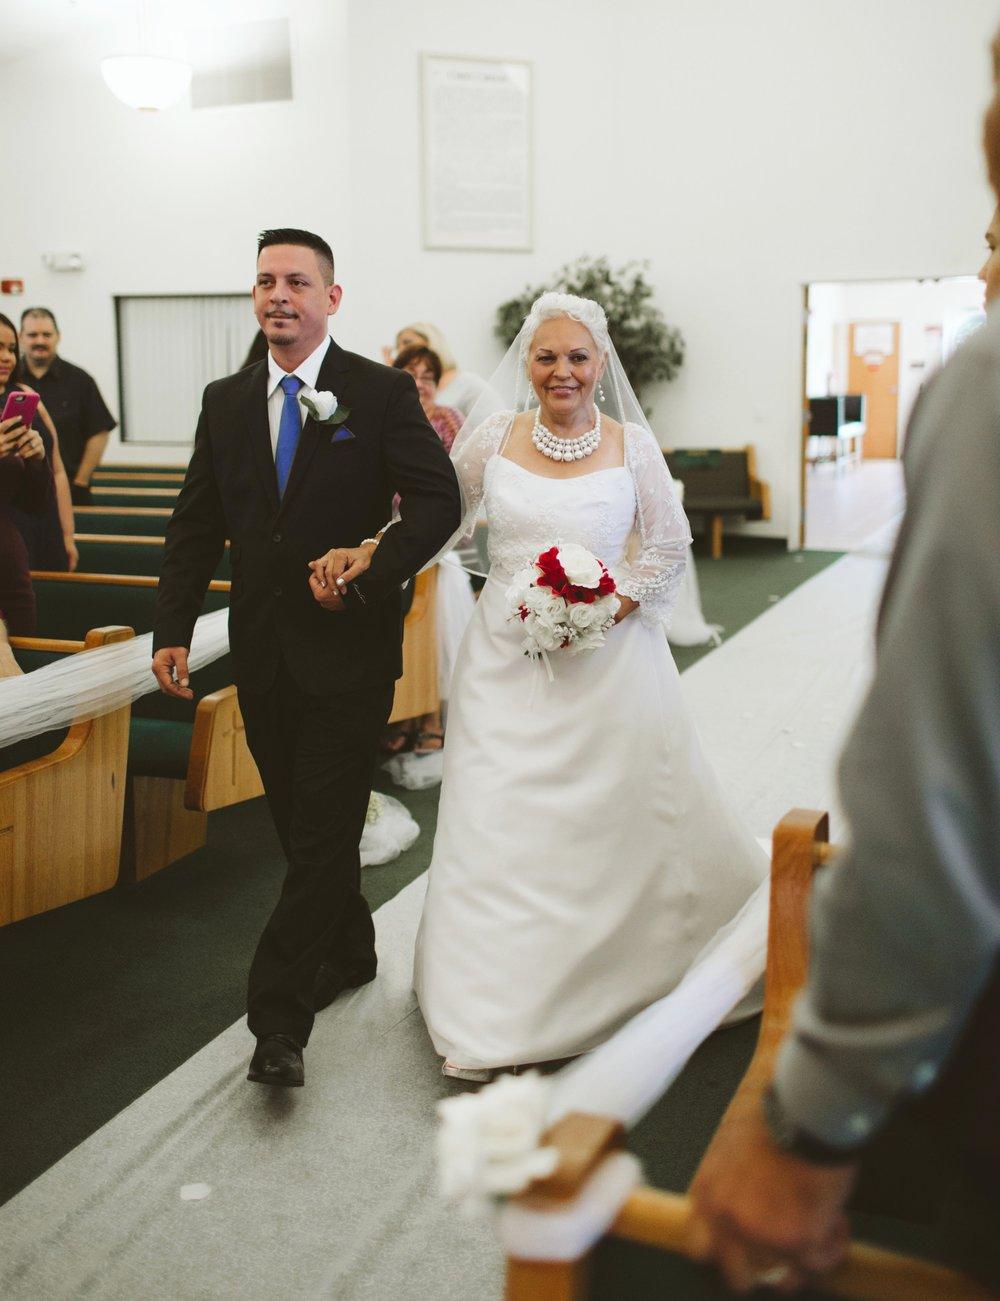 wedding | Vanessa Boy Photography | vanessaboy.com |-105.jpg